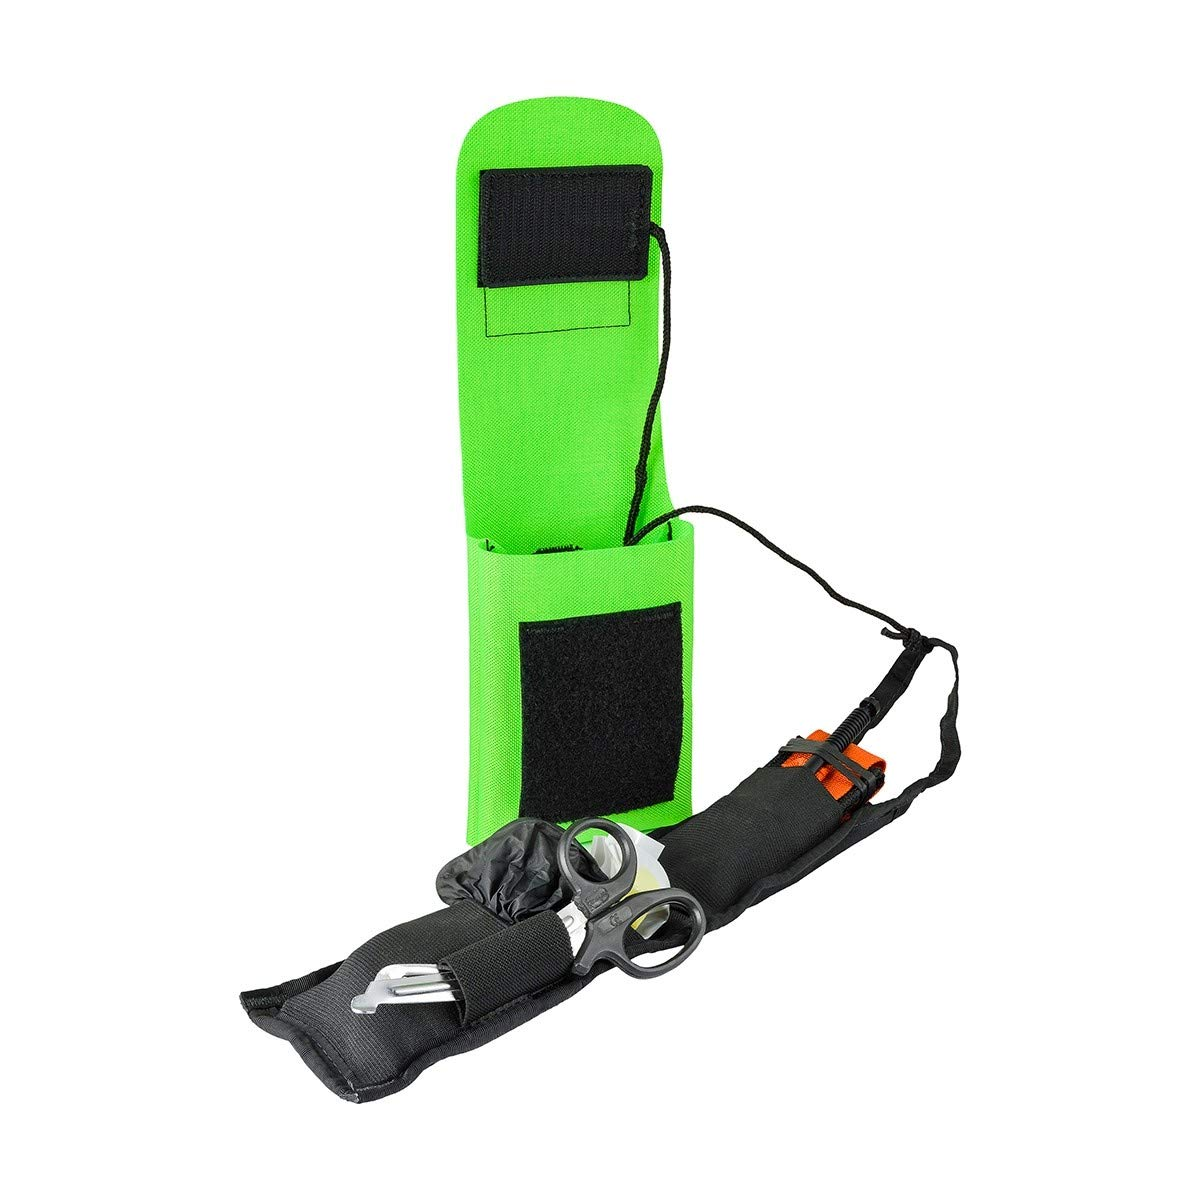 SherrillTree Arborist Medical Kit - Basic Version - Neon Green by SherrillTree (Image #1)